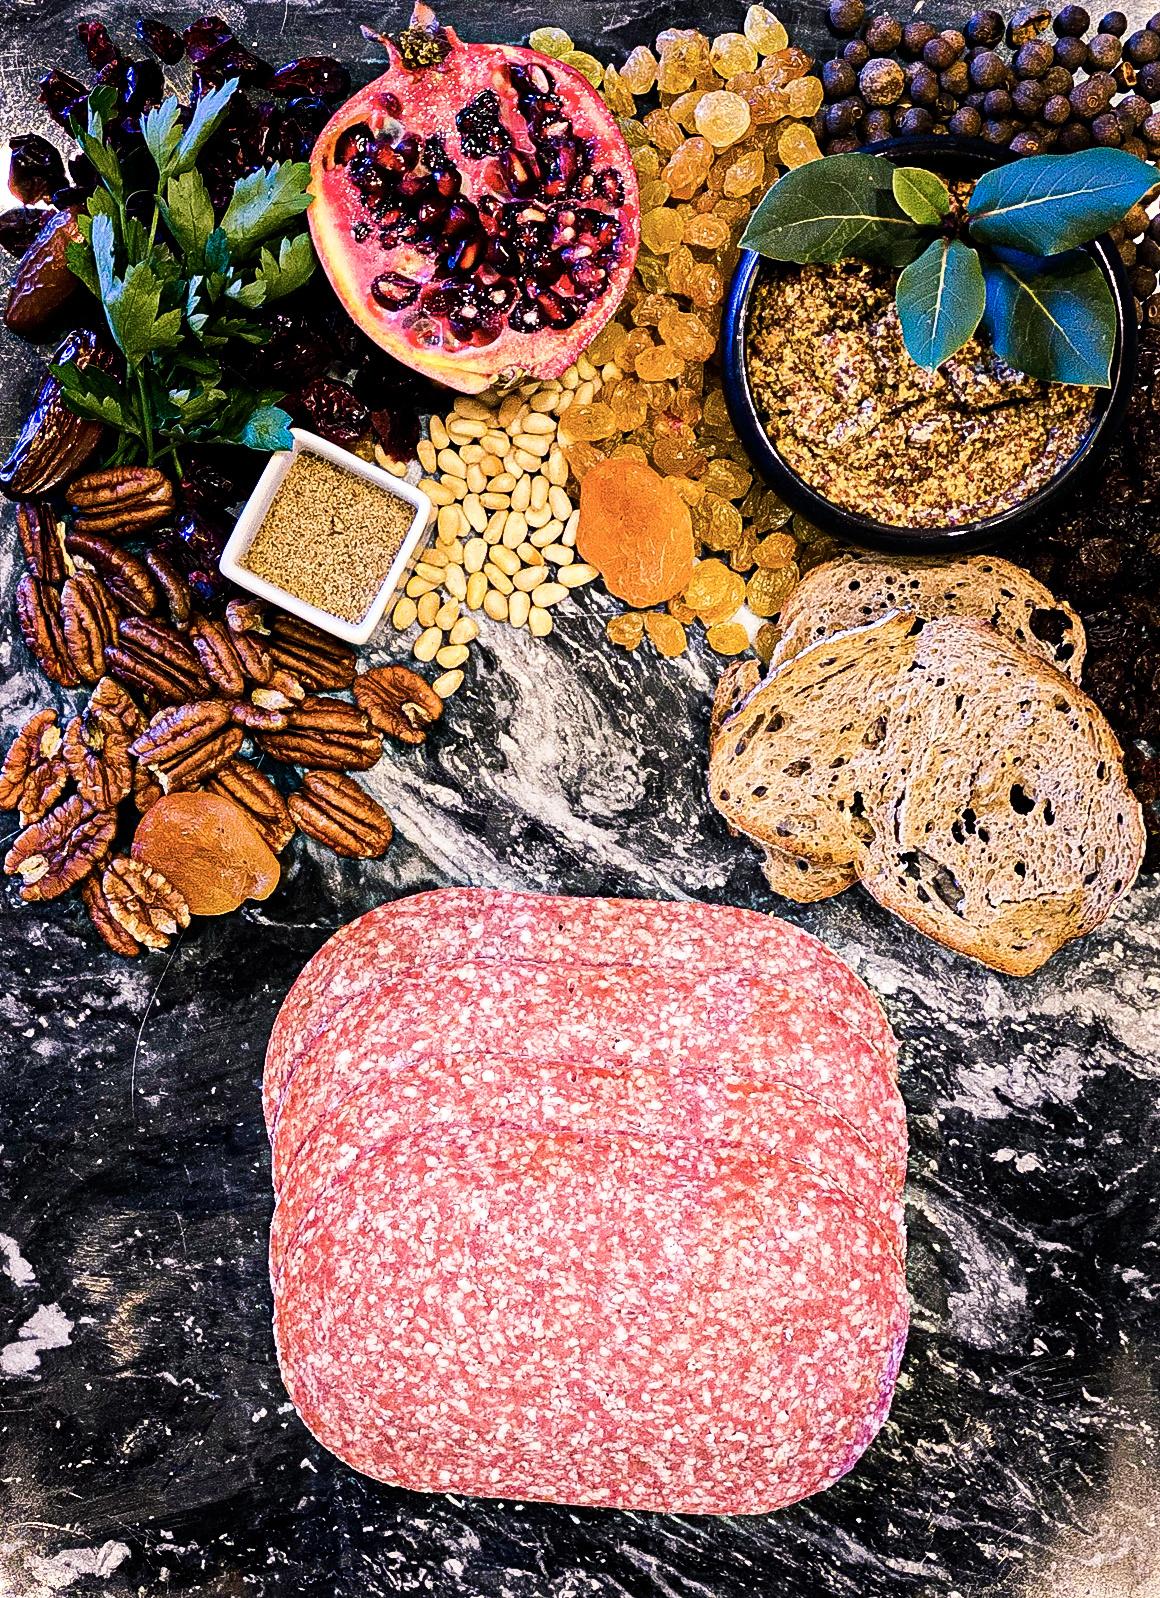 Fijnkost salami-1